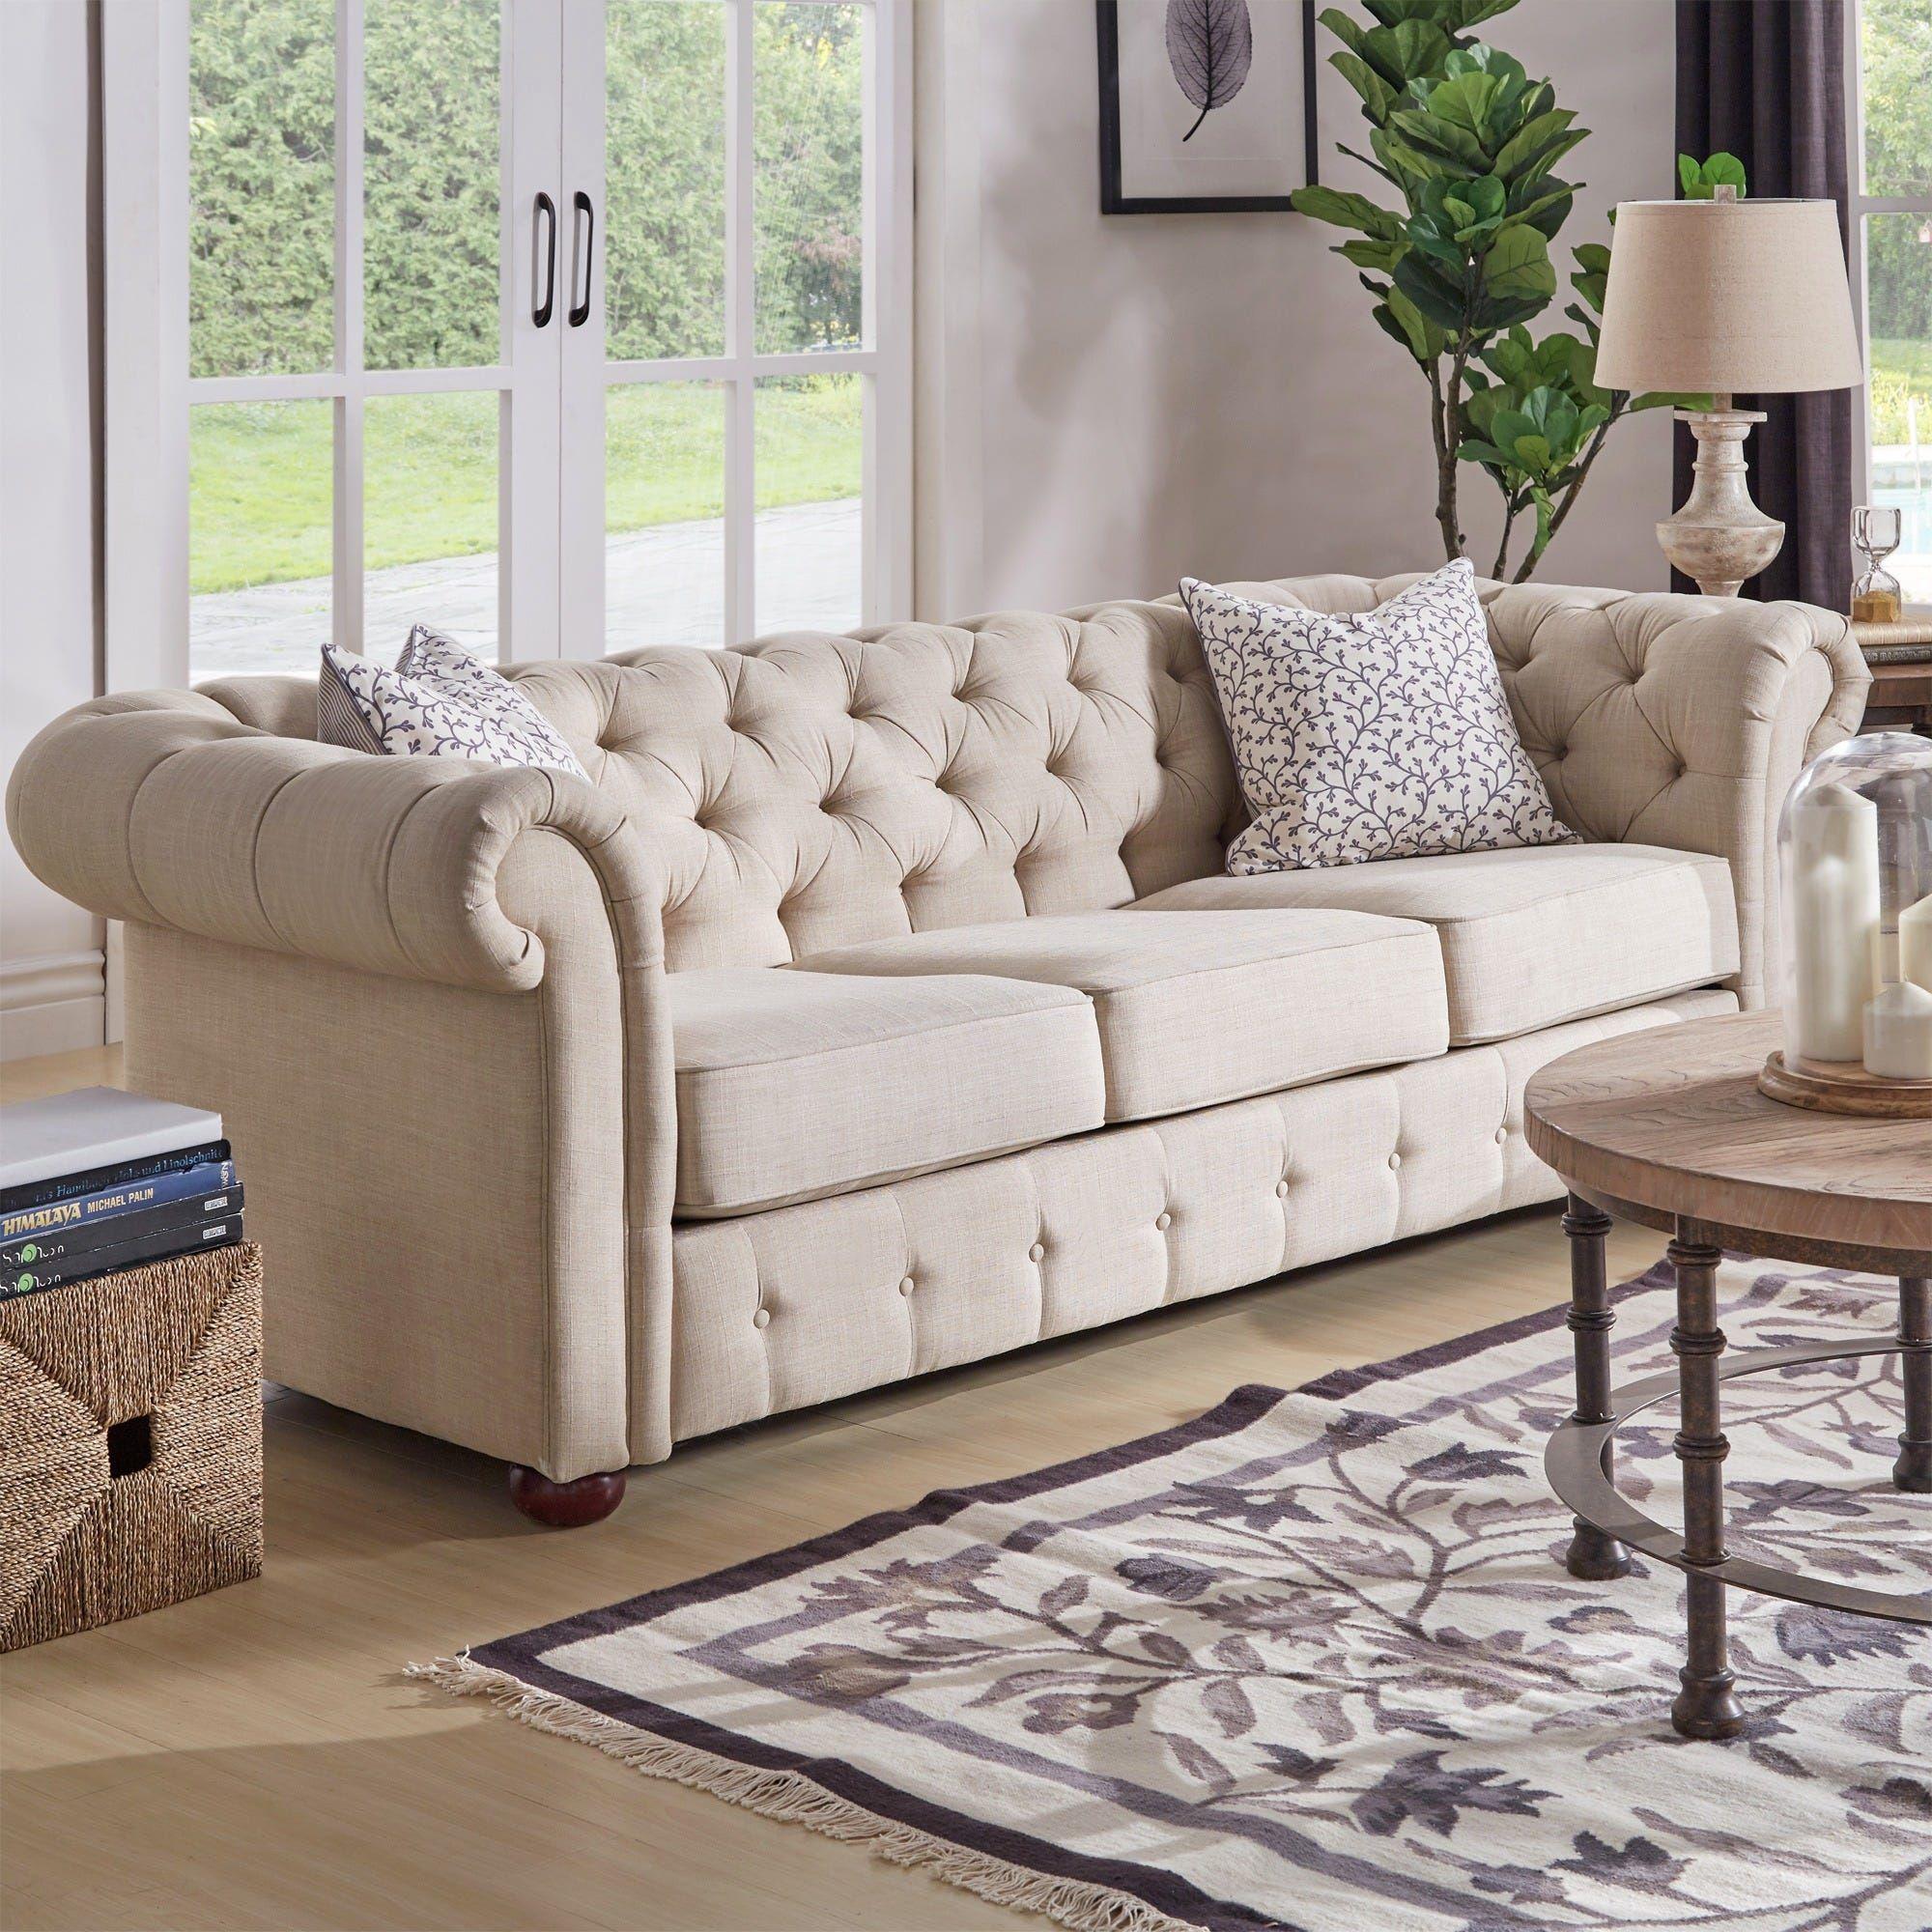 Best Knightsbridge Beige Fabric Button Tufted Chesterfield Sofa 400 x 300